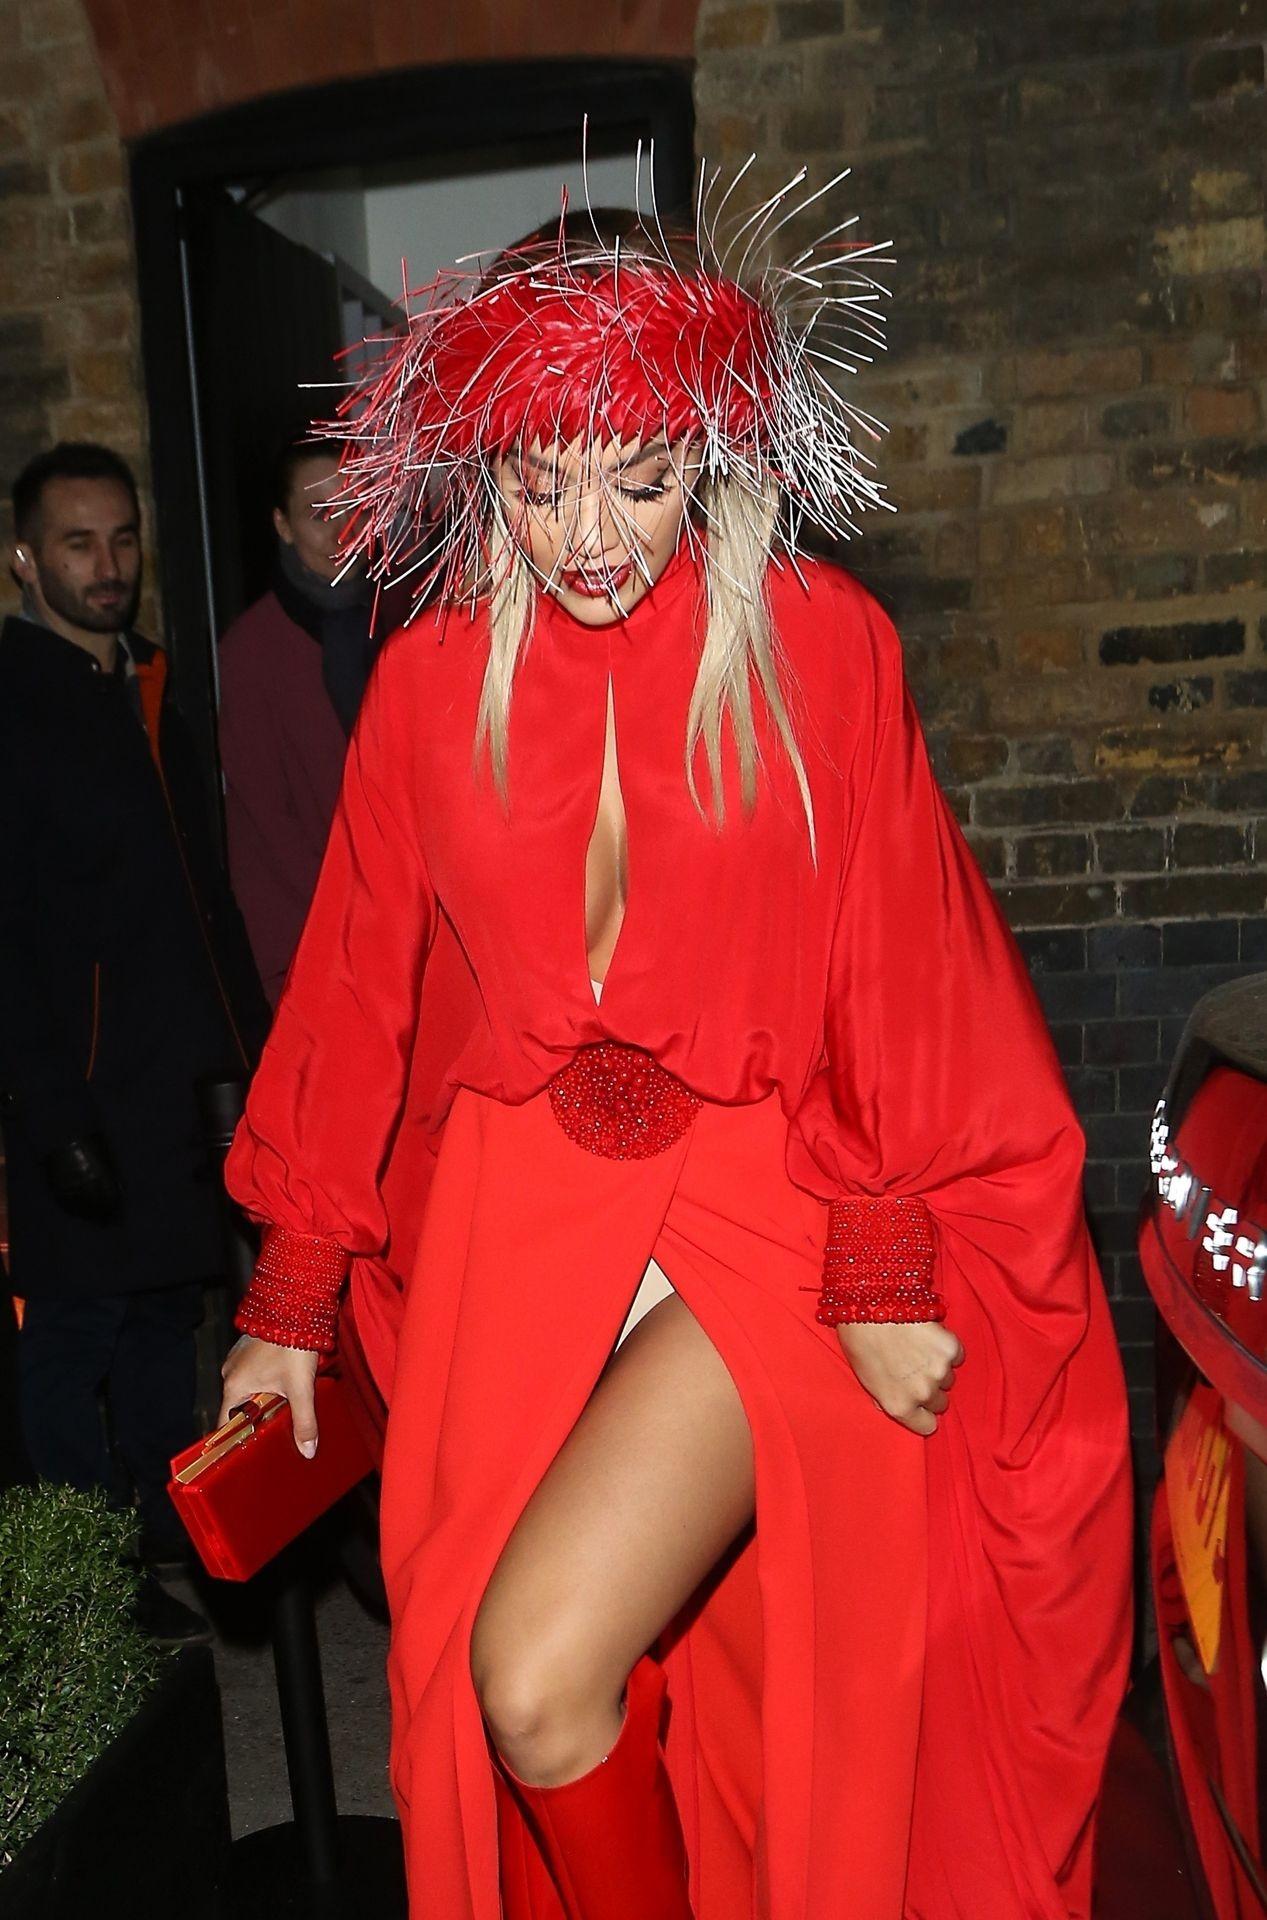 Rita Ora Sexy Pictures, Revealing Red Dress